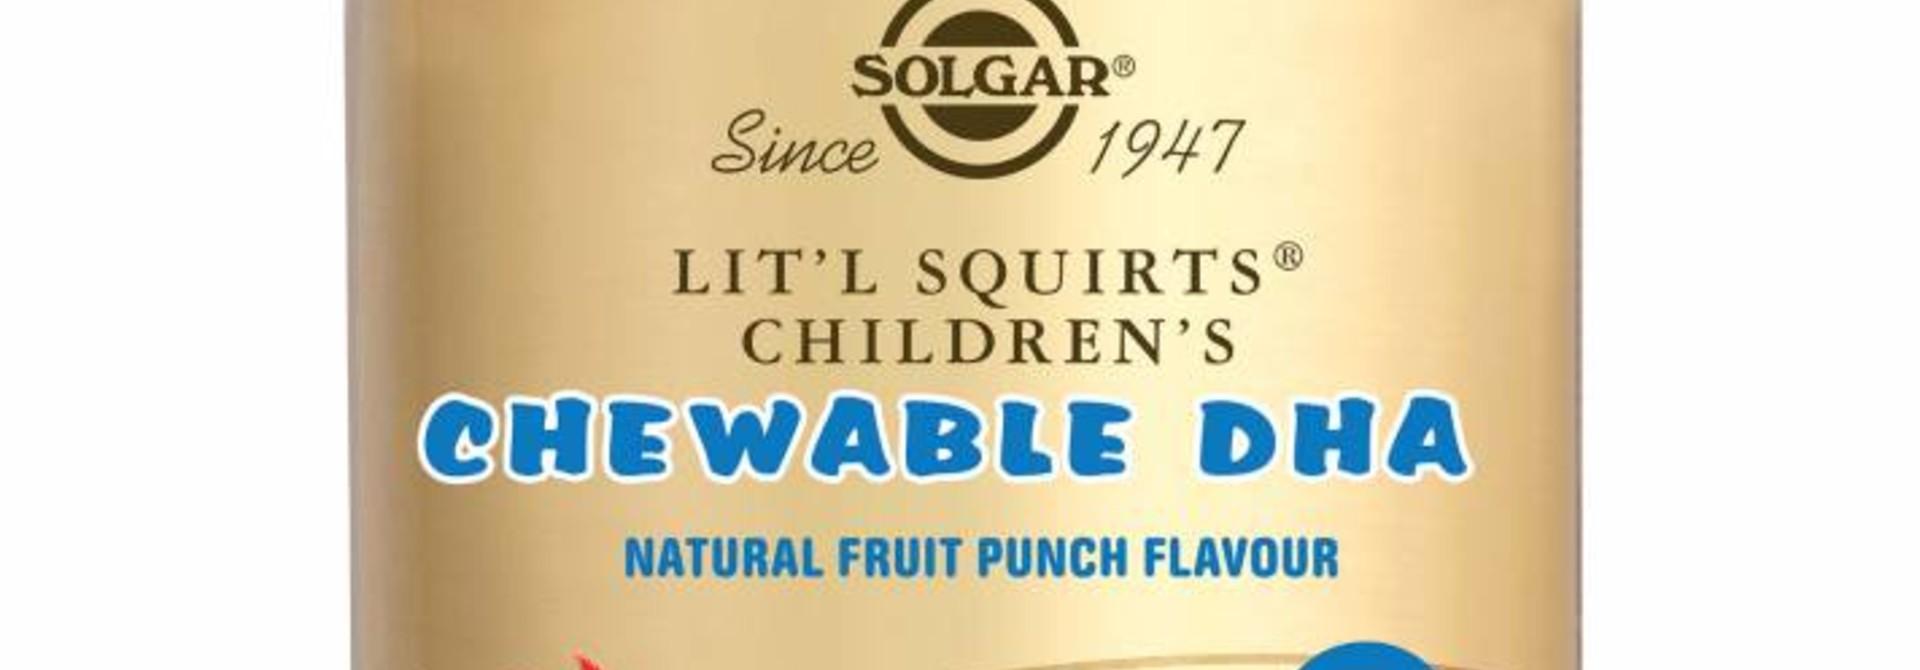 Lit'l Squirts® Children's Chewable DHA 90 kauwbare softgels